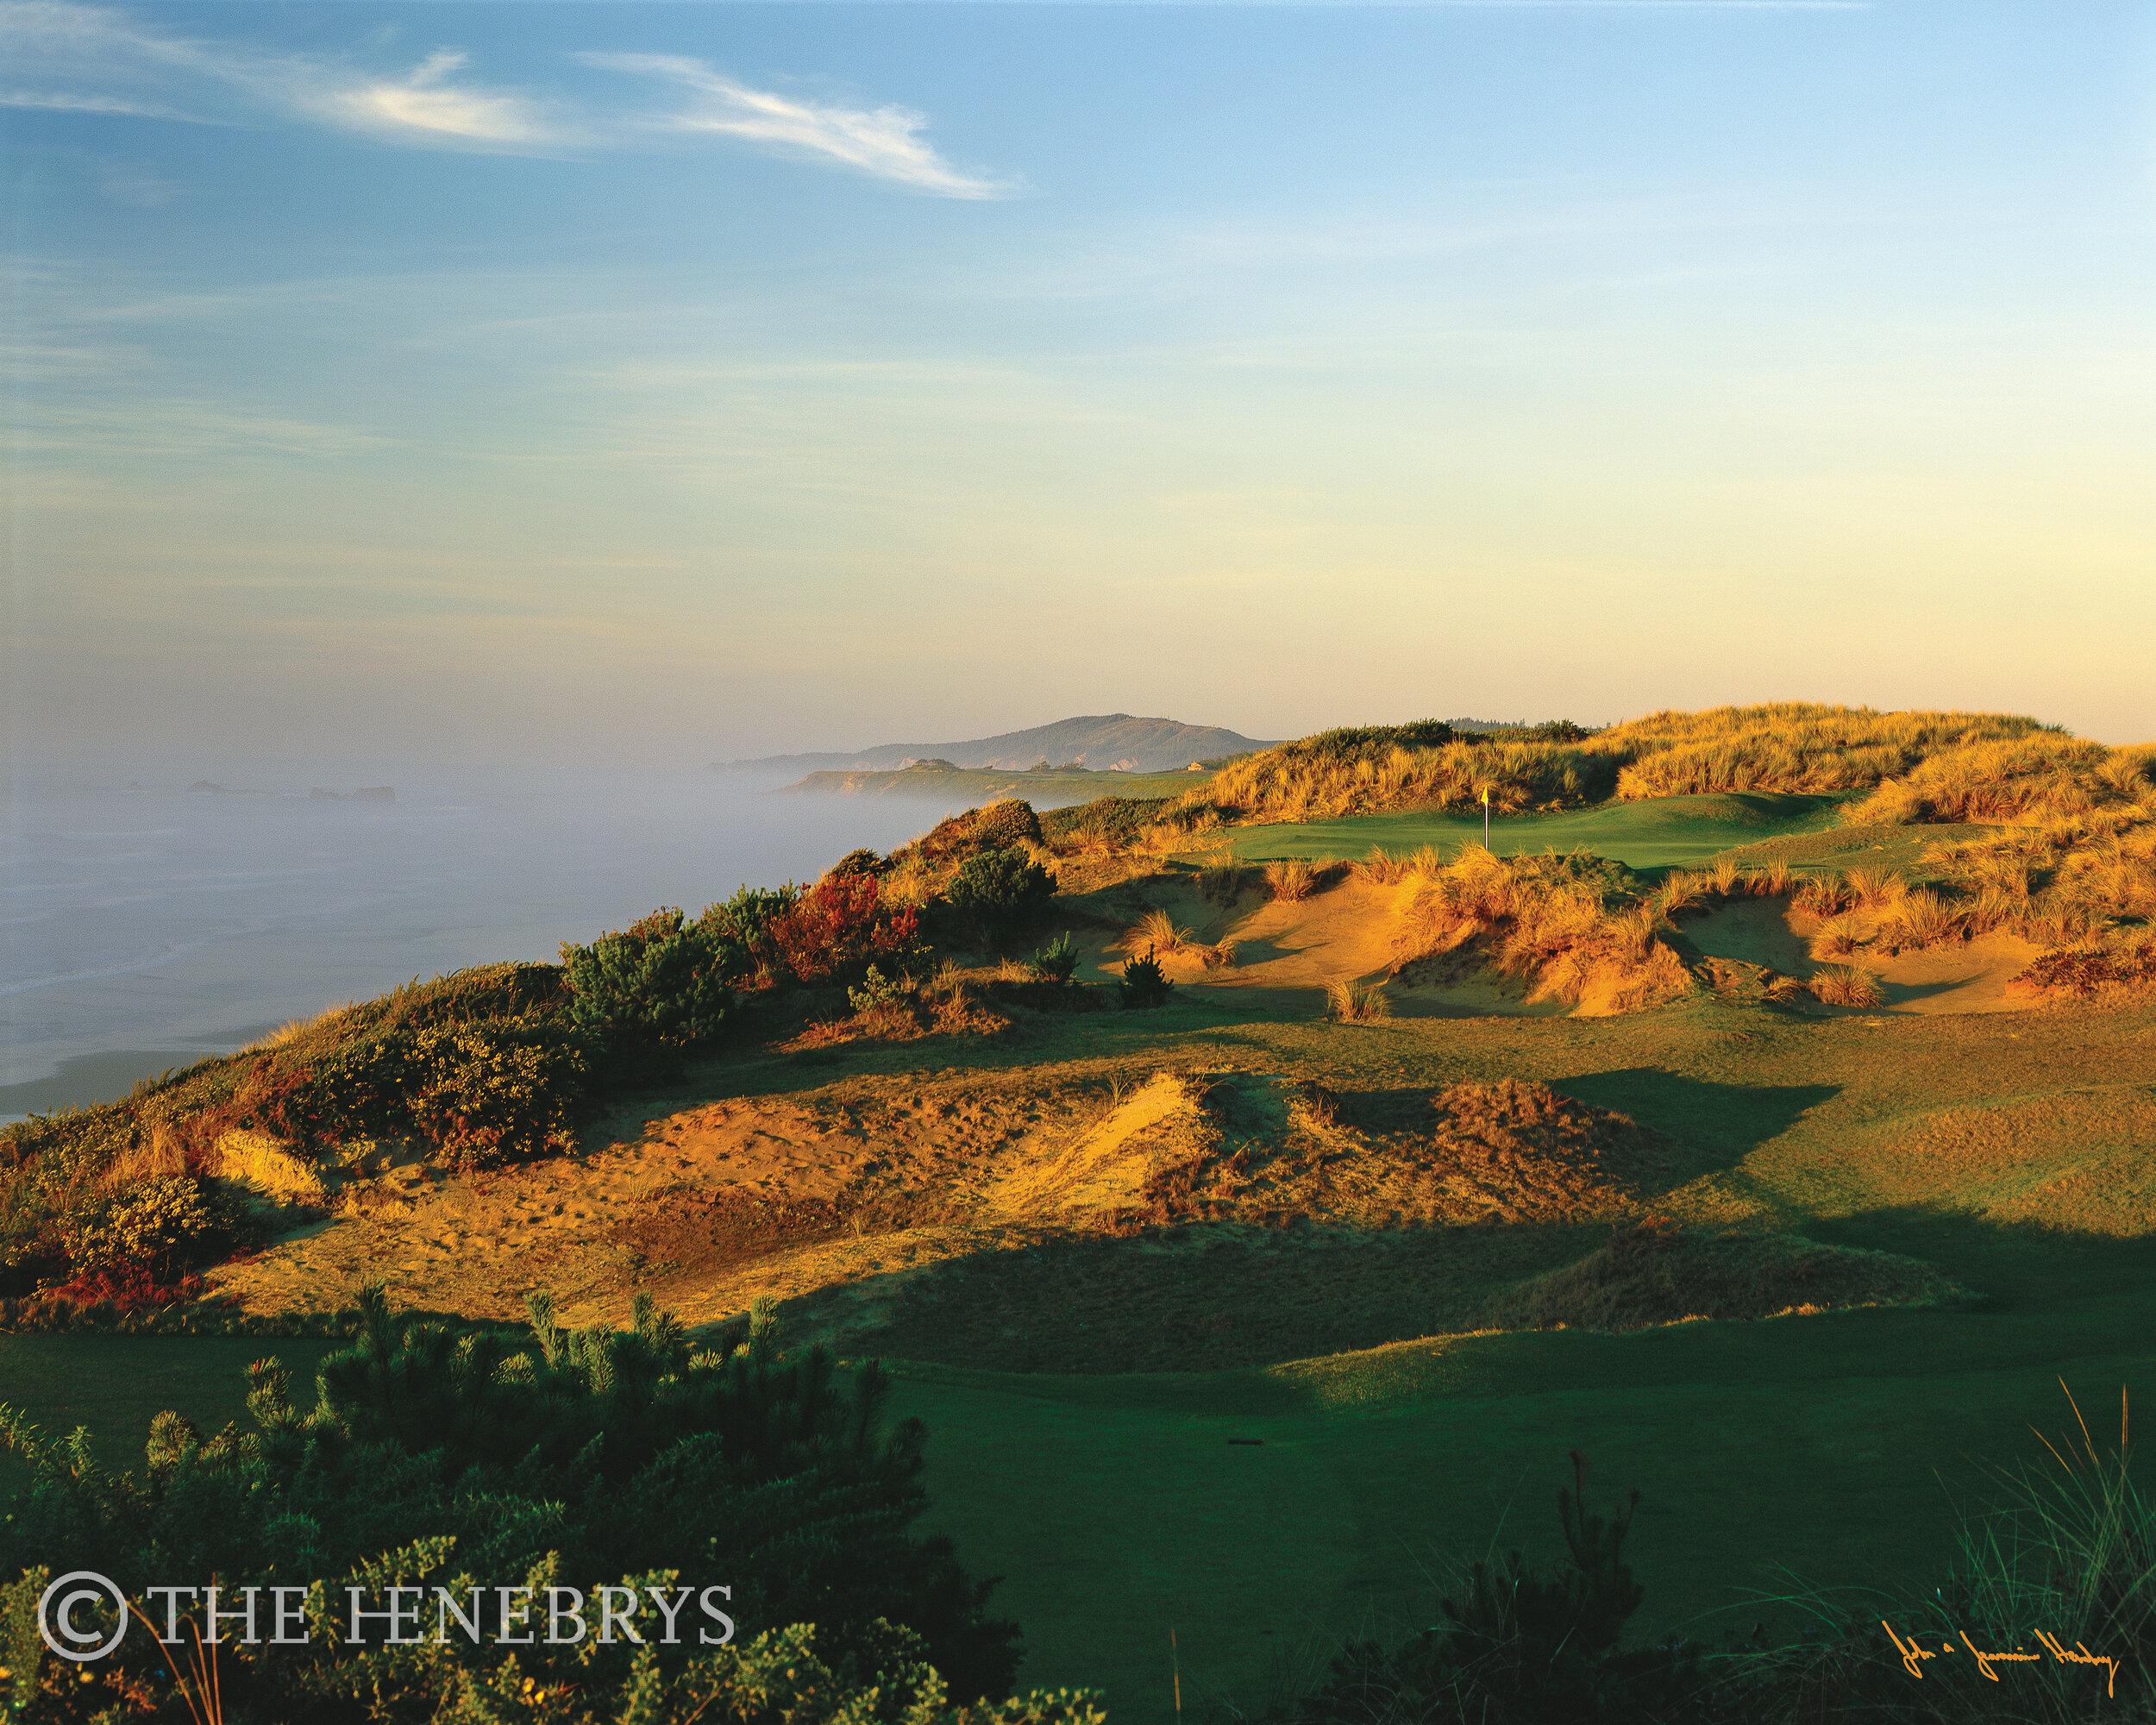 Pacific Dunes Golf Club #11, Bandon, Oregon